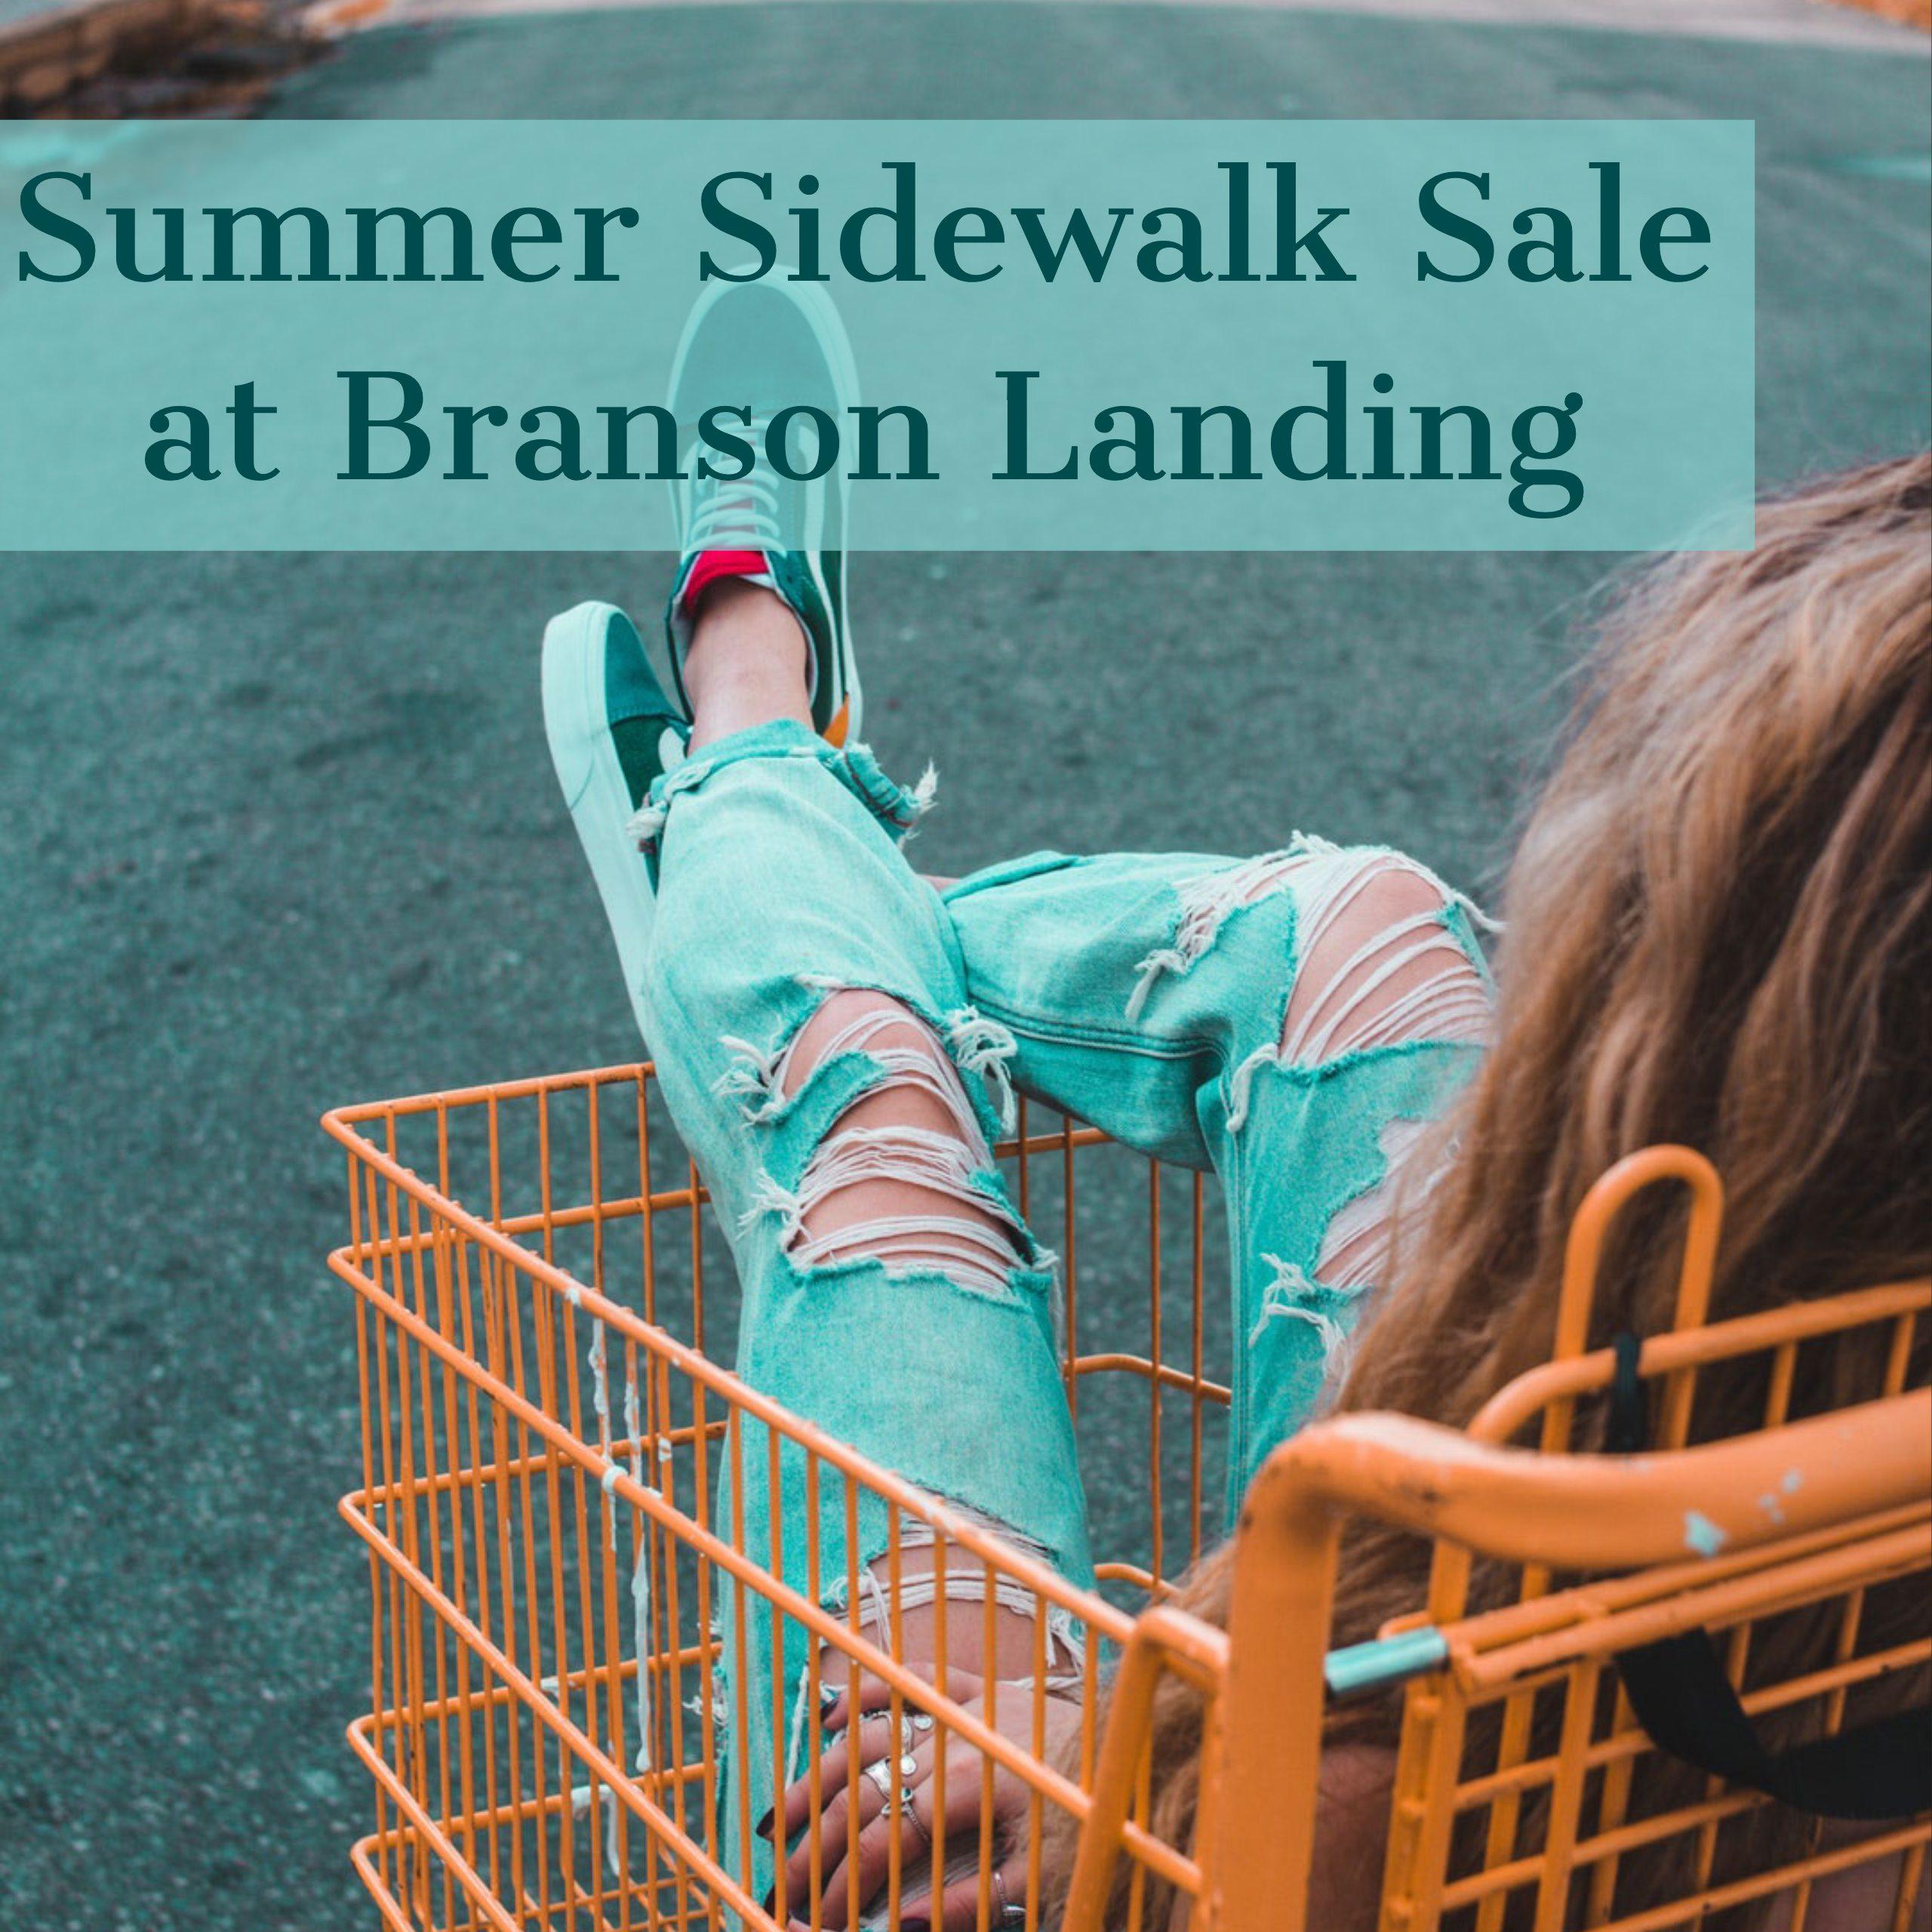 SIDEWALK SALE AT BRANSON LANDING